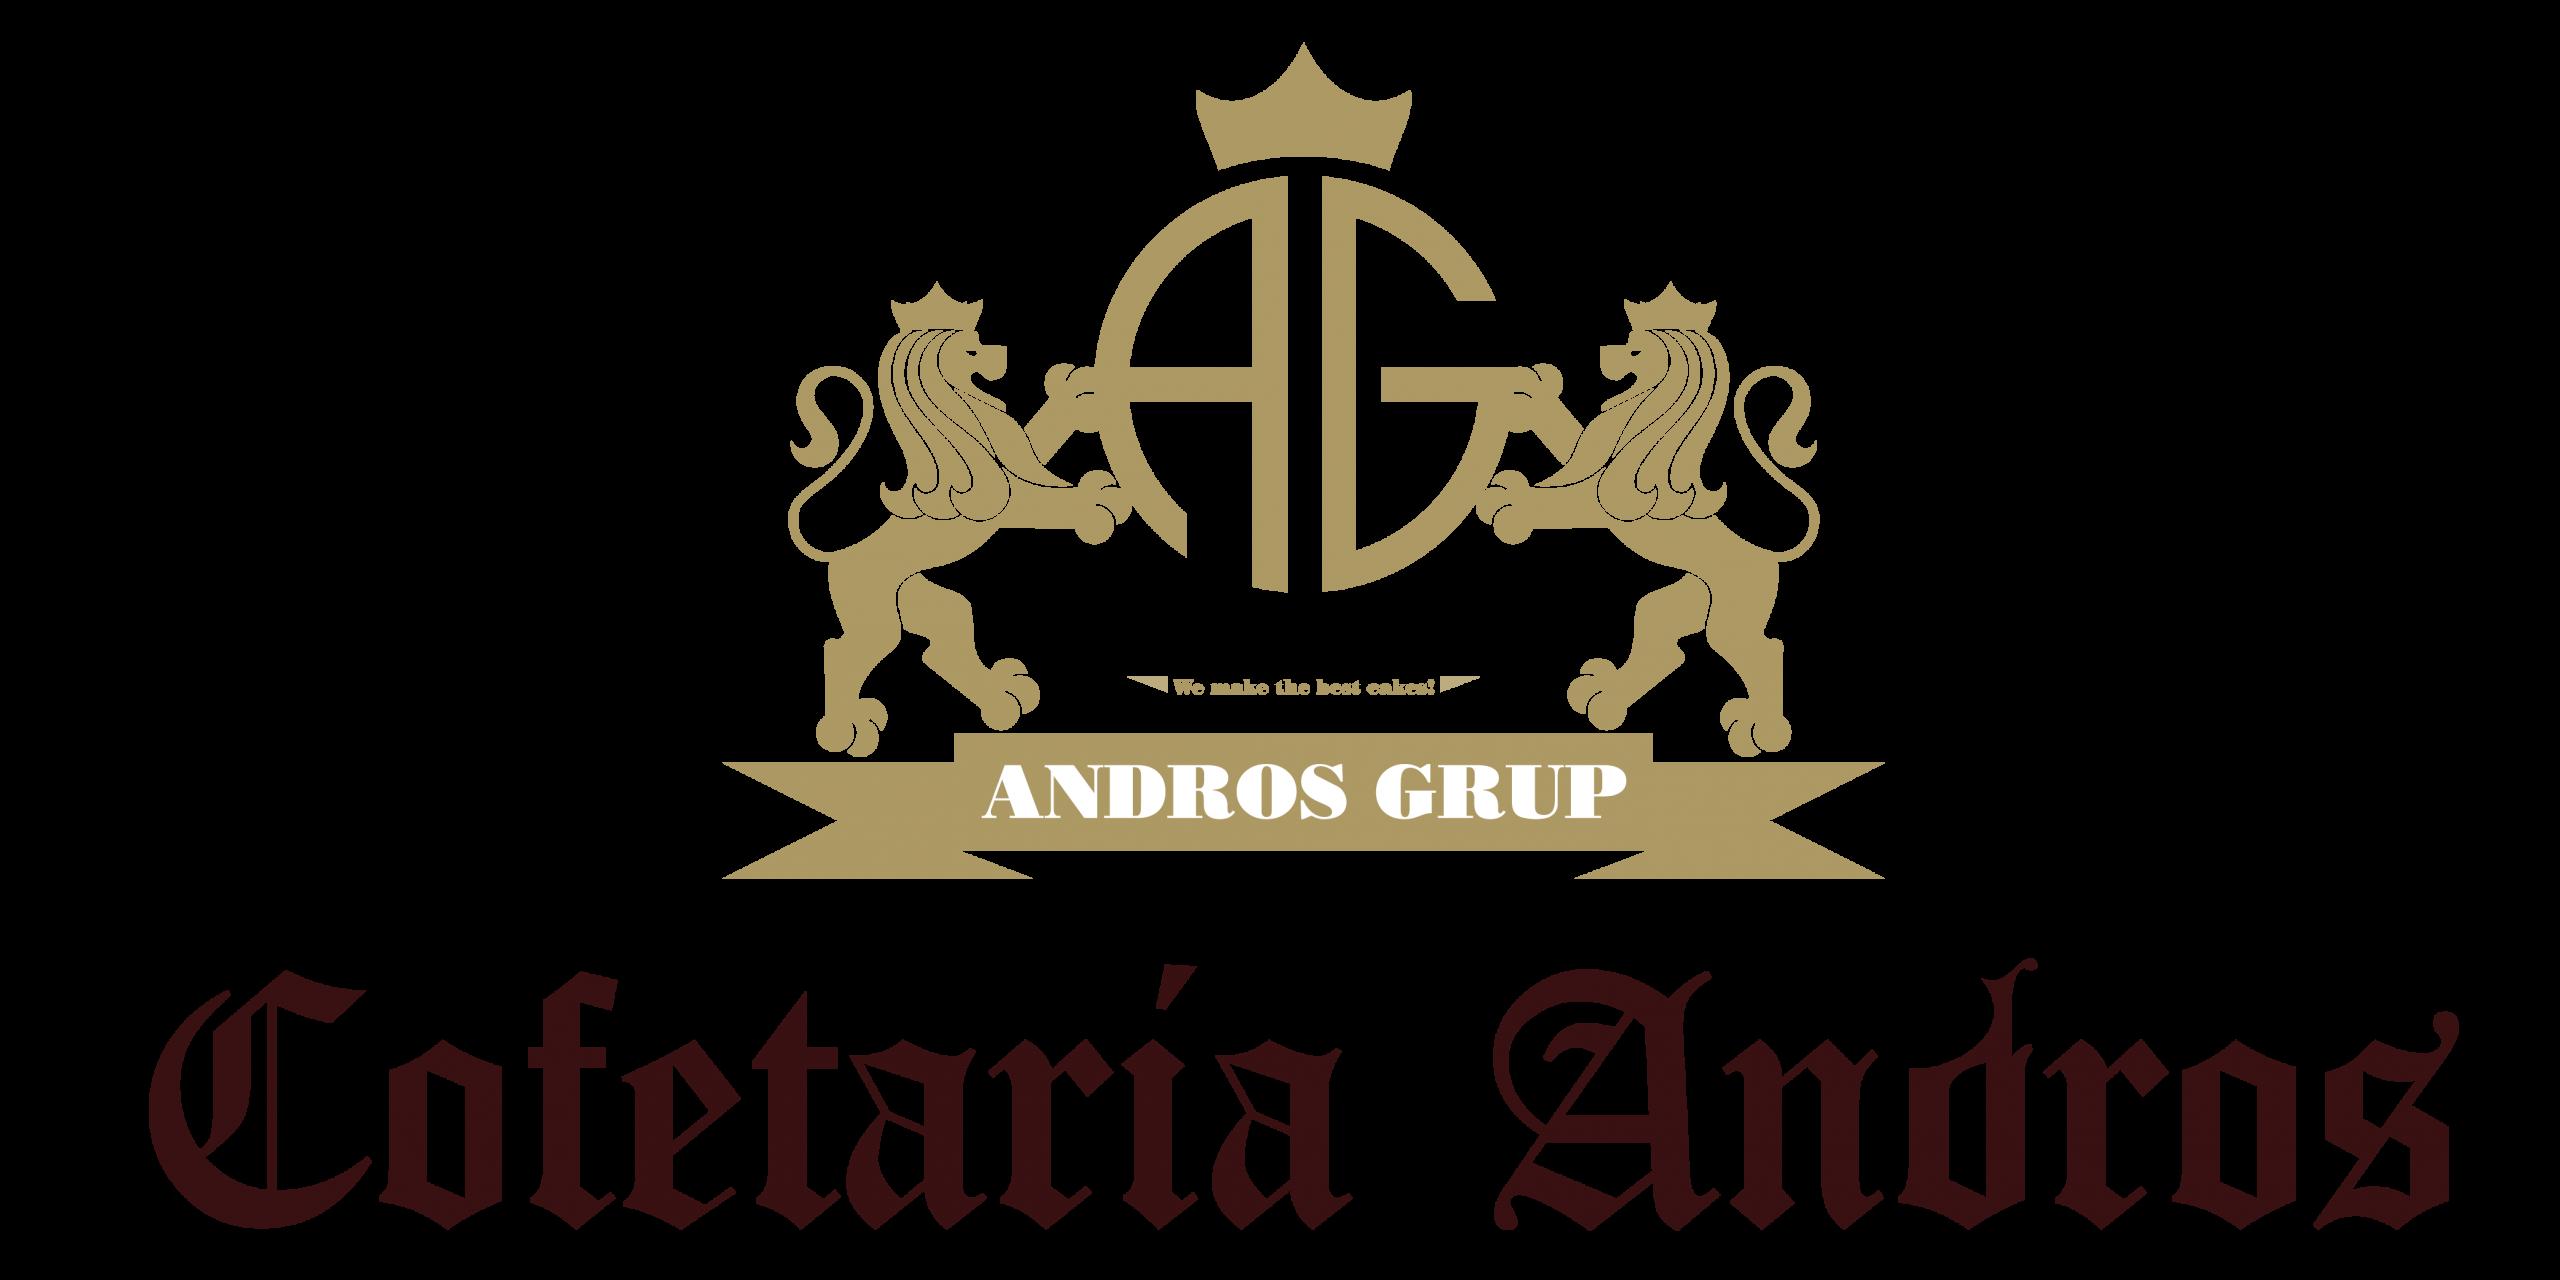 Cofetaria Andros